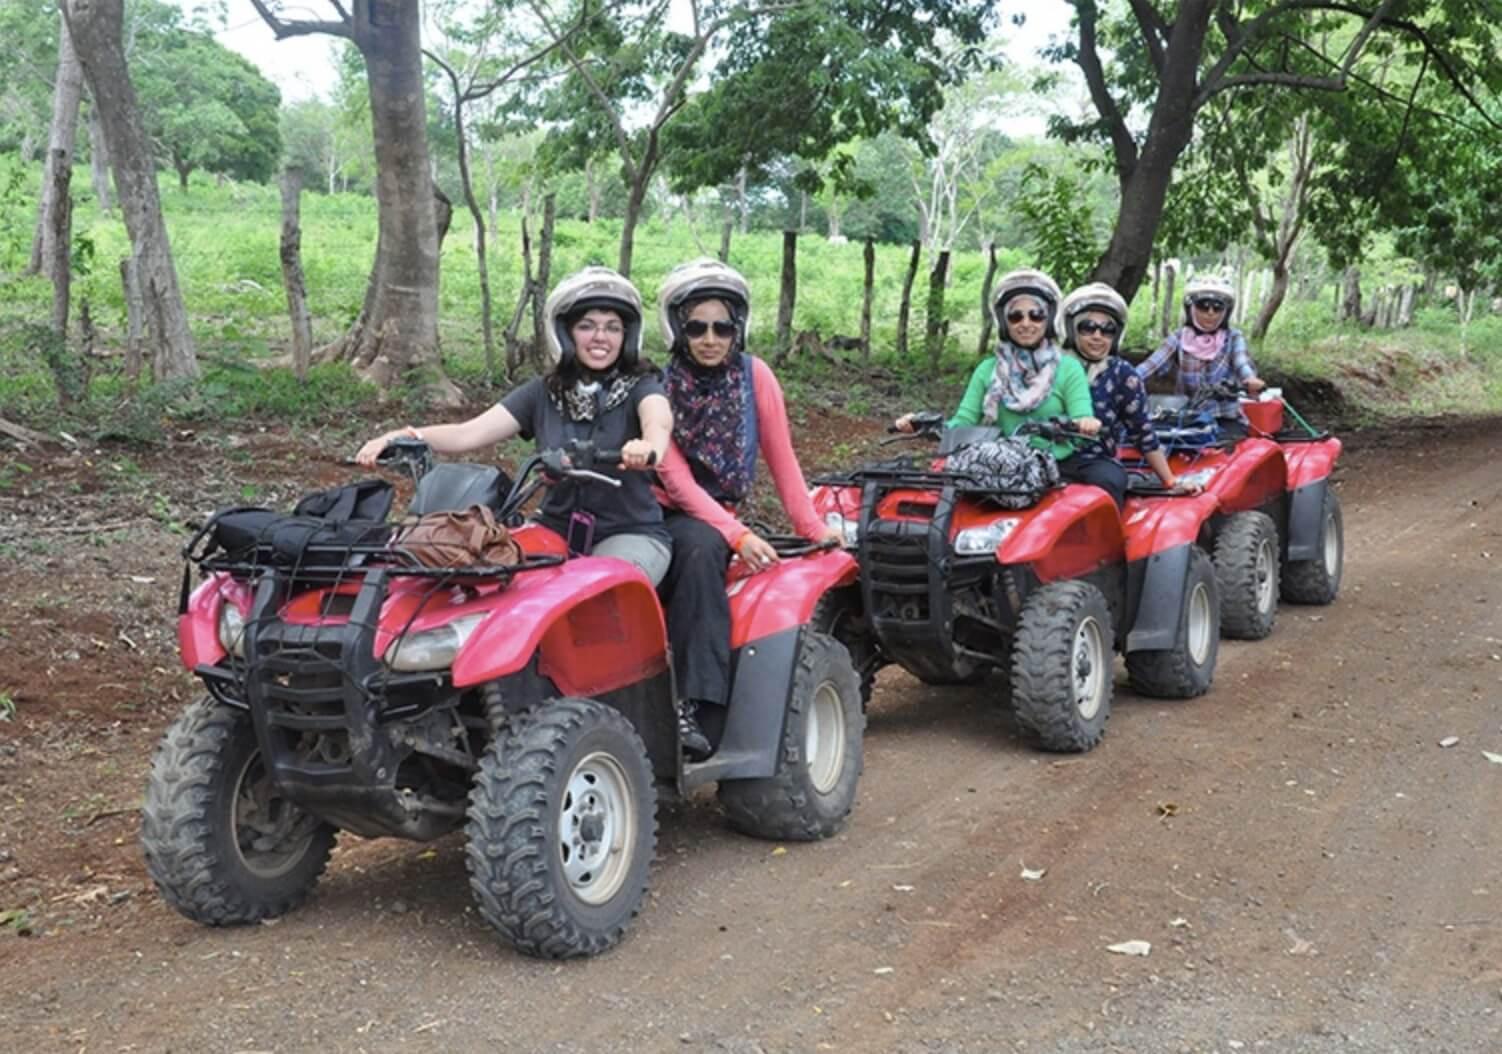 Tamarindo Guanacaste ATV adventure tour group enjoying their experience driving on dirt roads